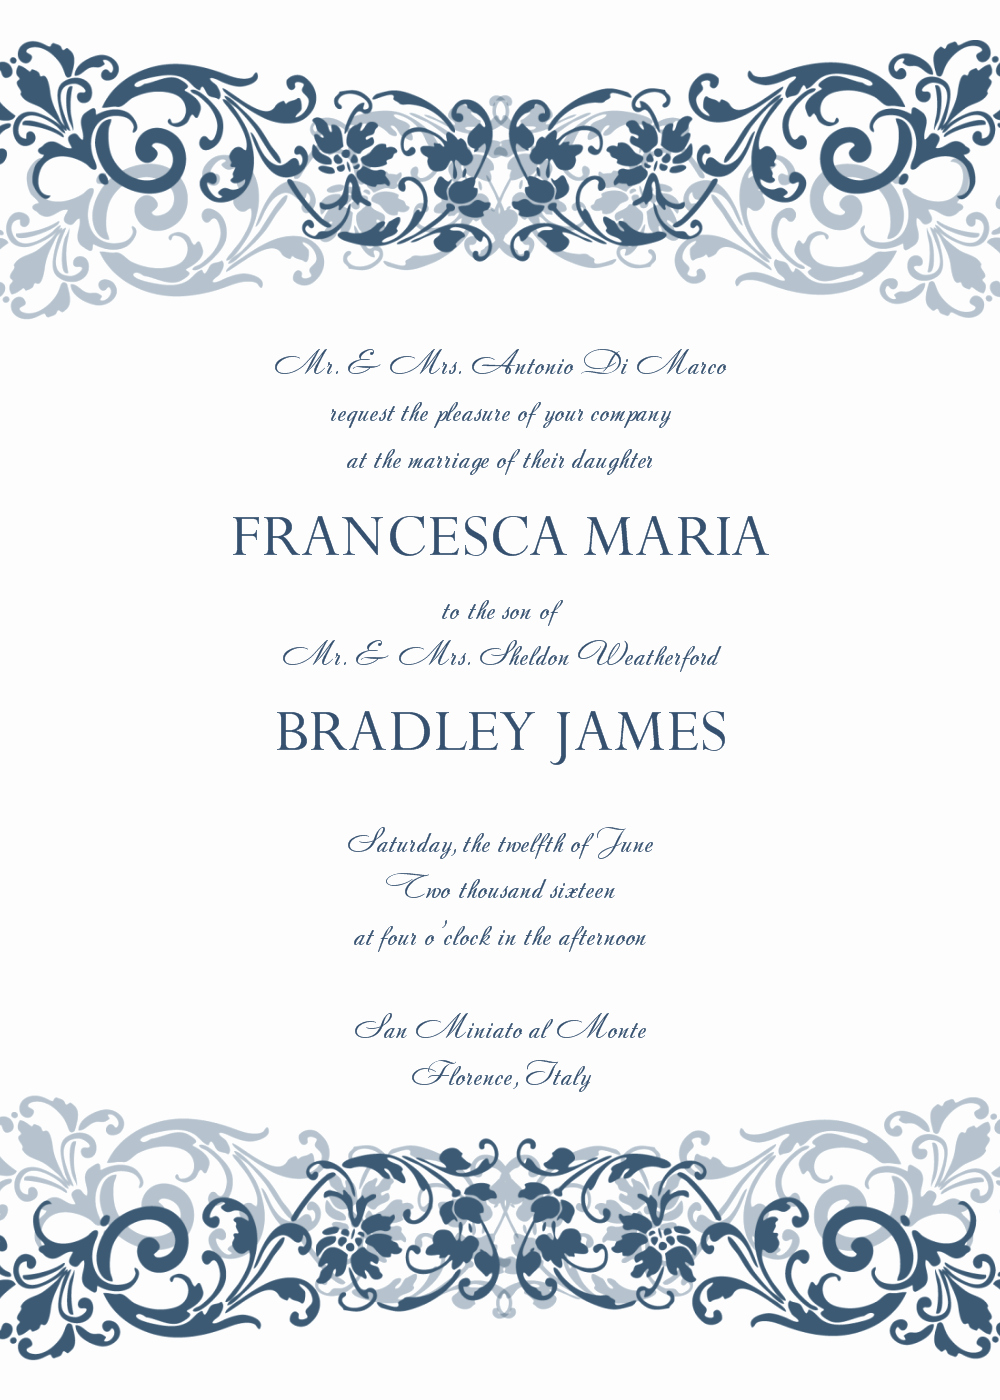 Free Wedding Invitation Templates Download Elegant 8 Free Wedding Invitation Templates Excel Pdf formats